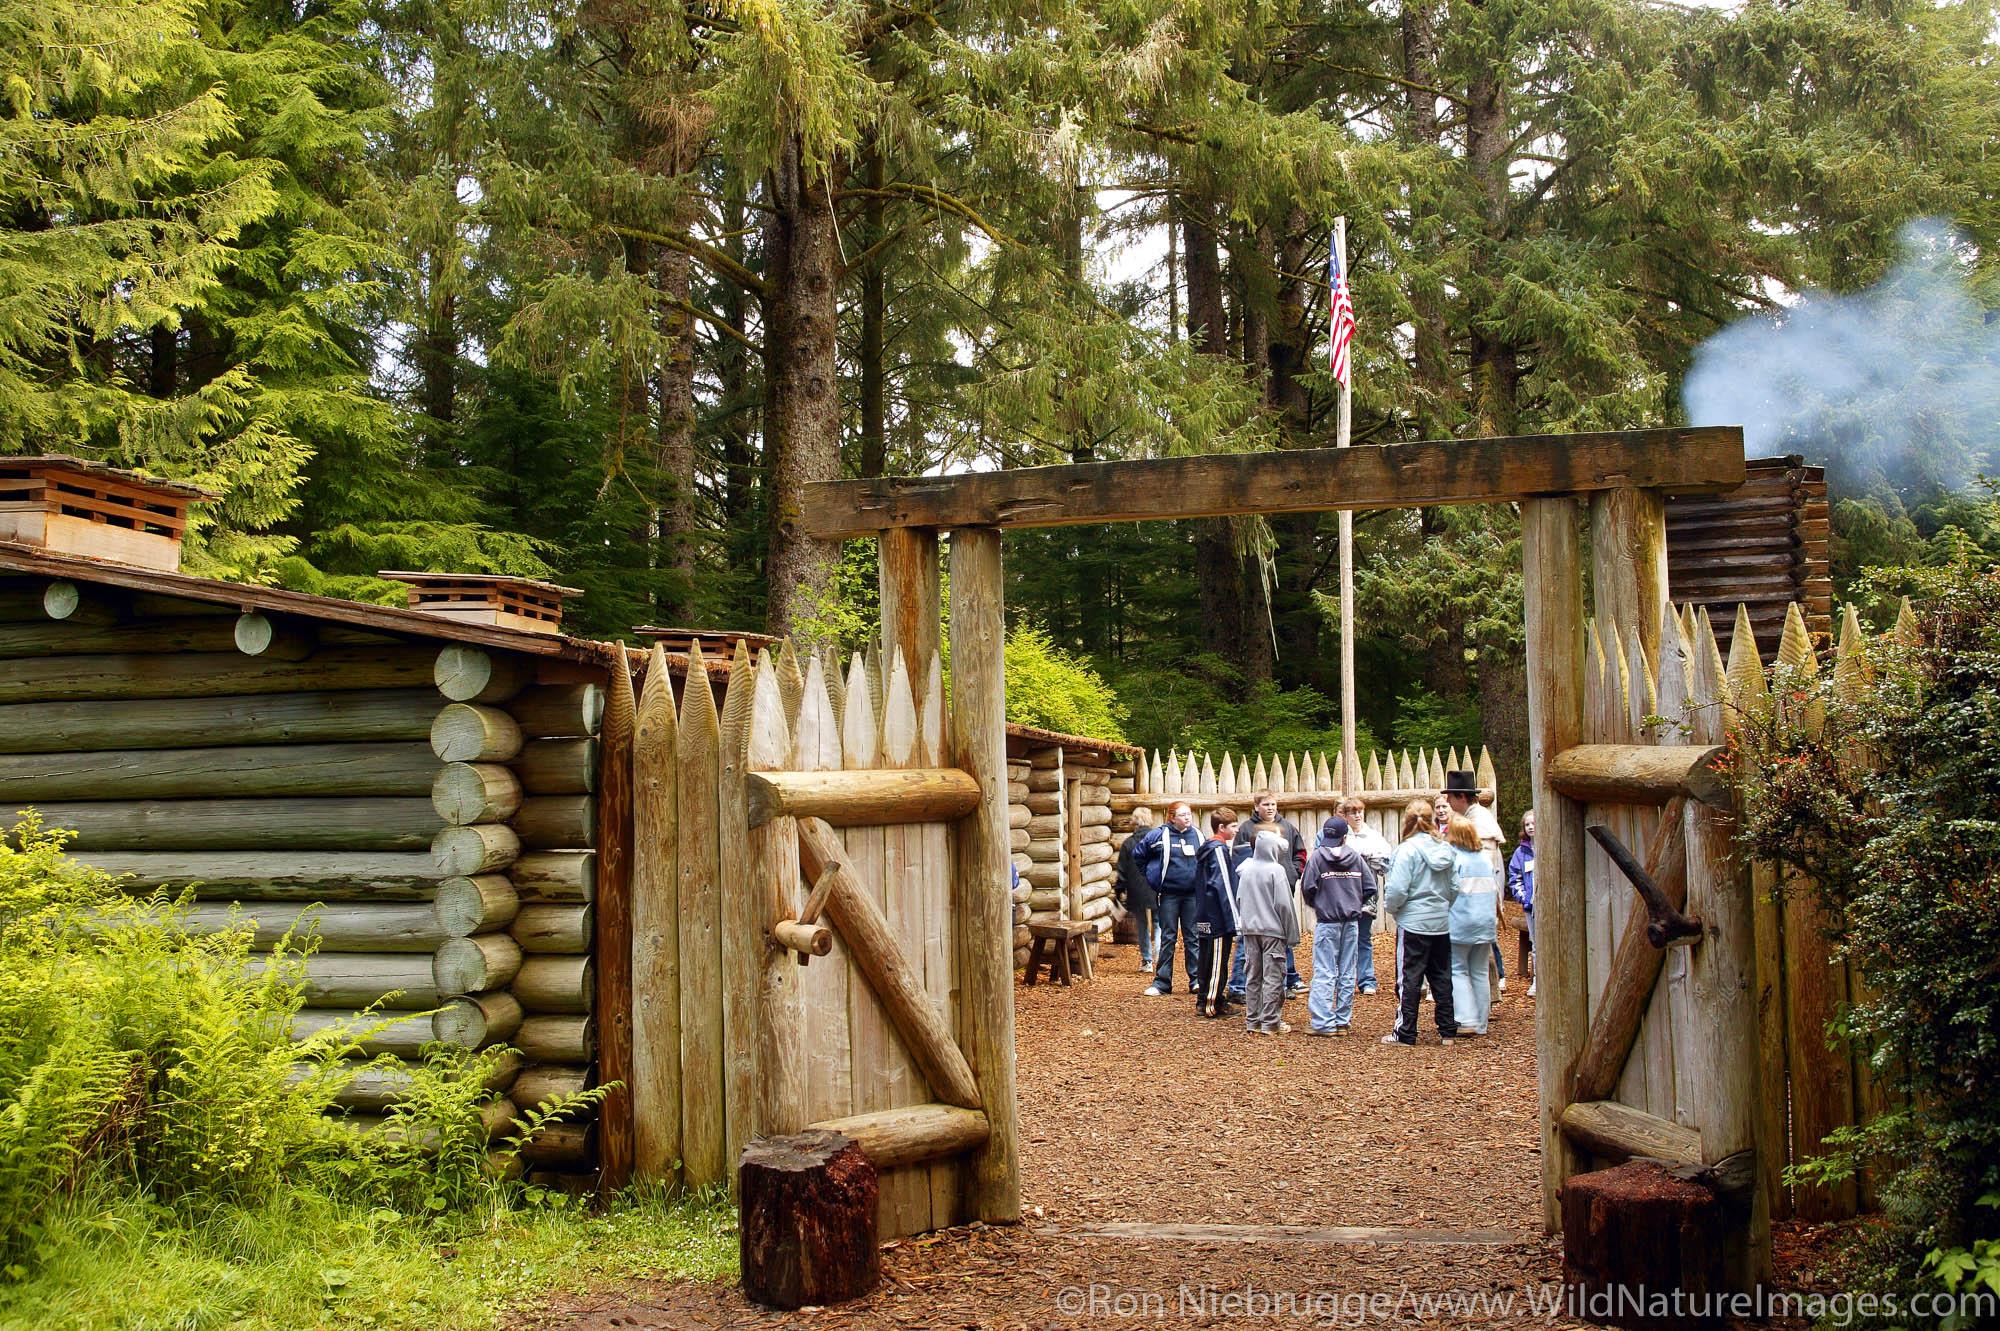 School Group visits Fort Clatsop National Memorial, near Astoria, Oregon.